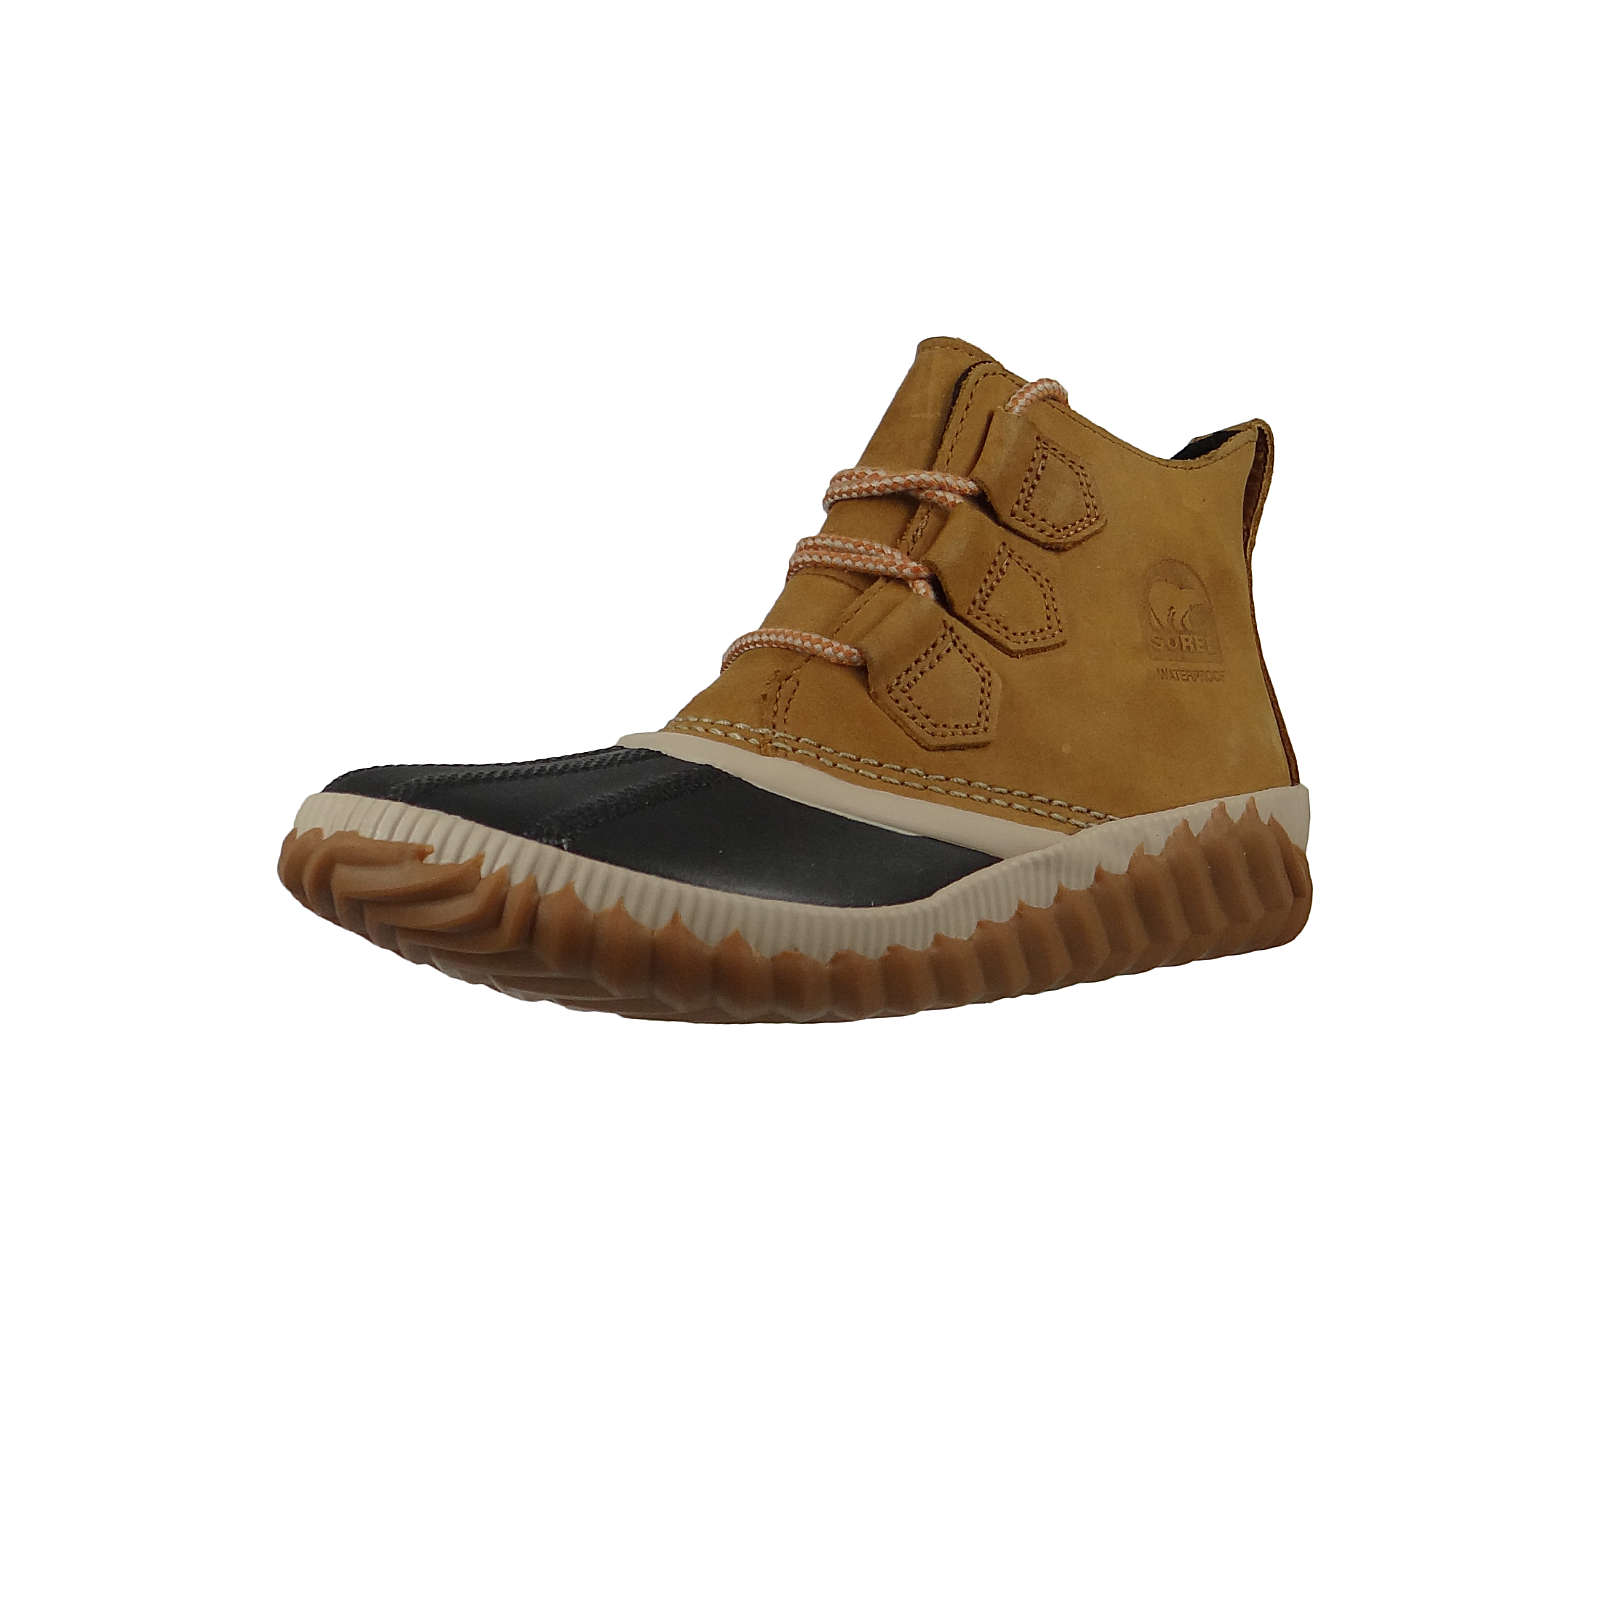 SOREL Leder Stiefelette Out´n About Plus Elk Braun NL3069-286 Ankle Boots